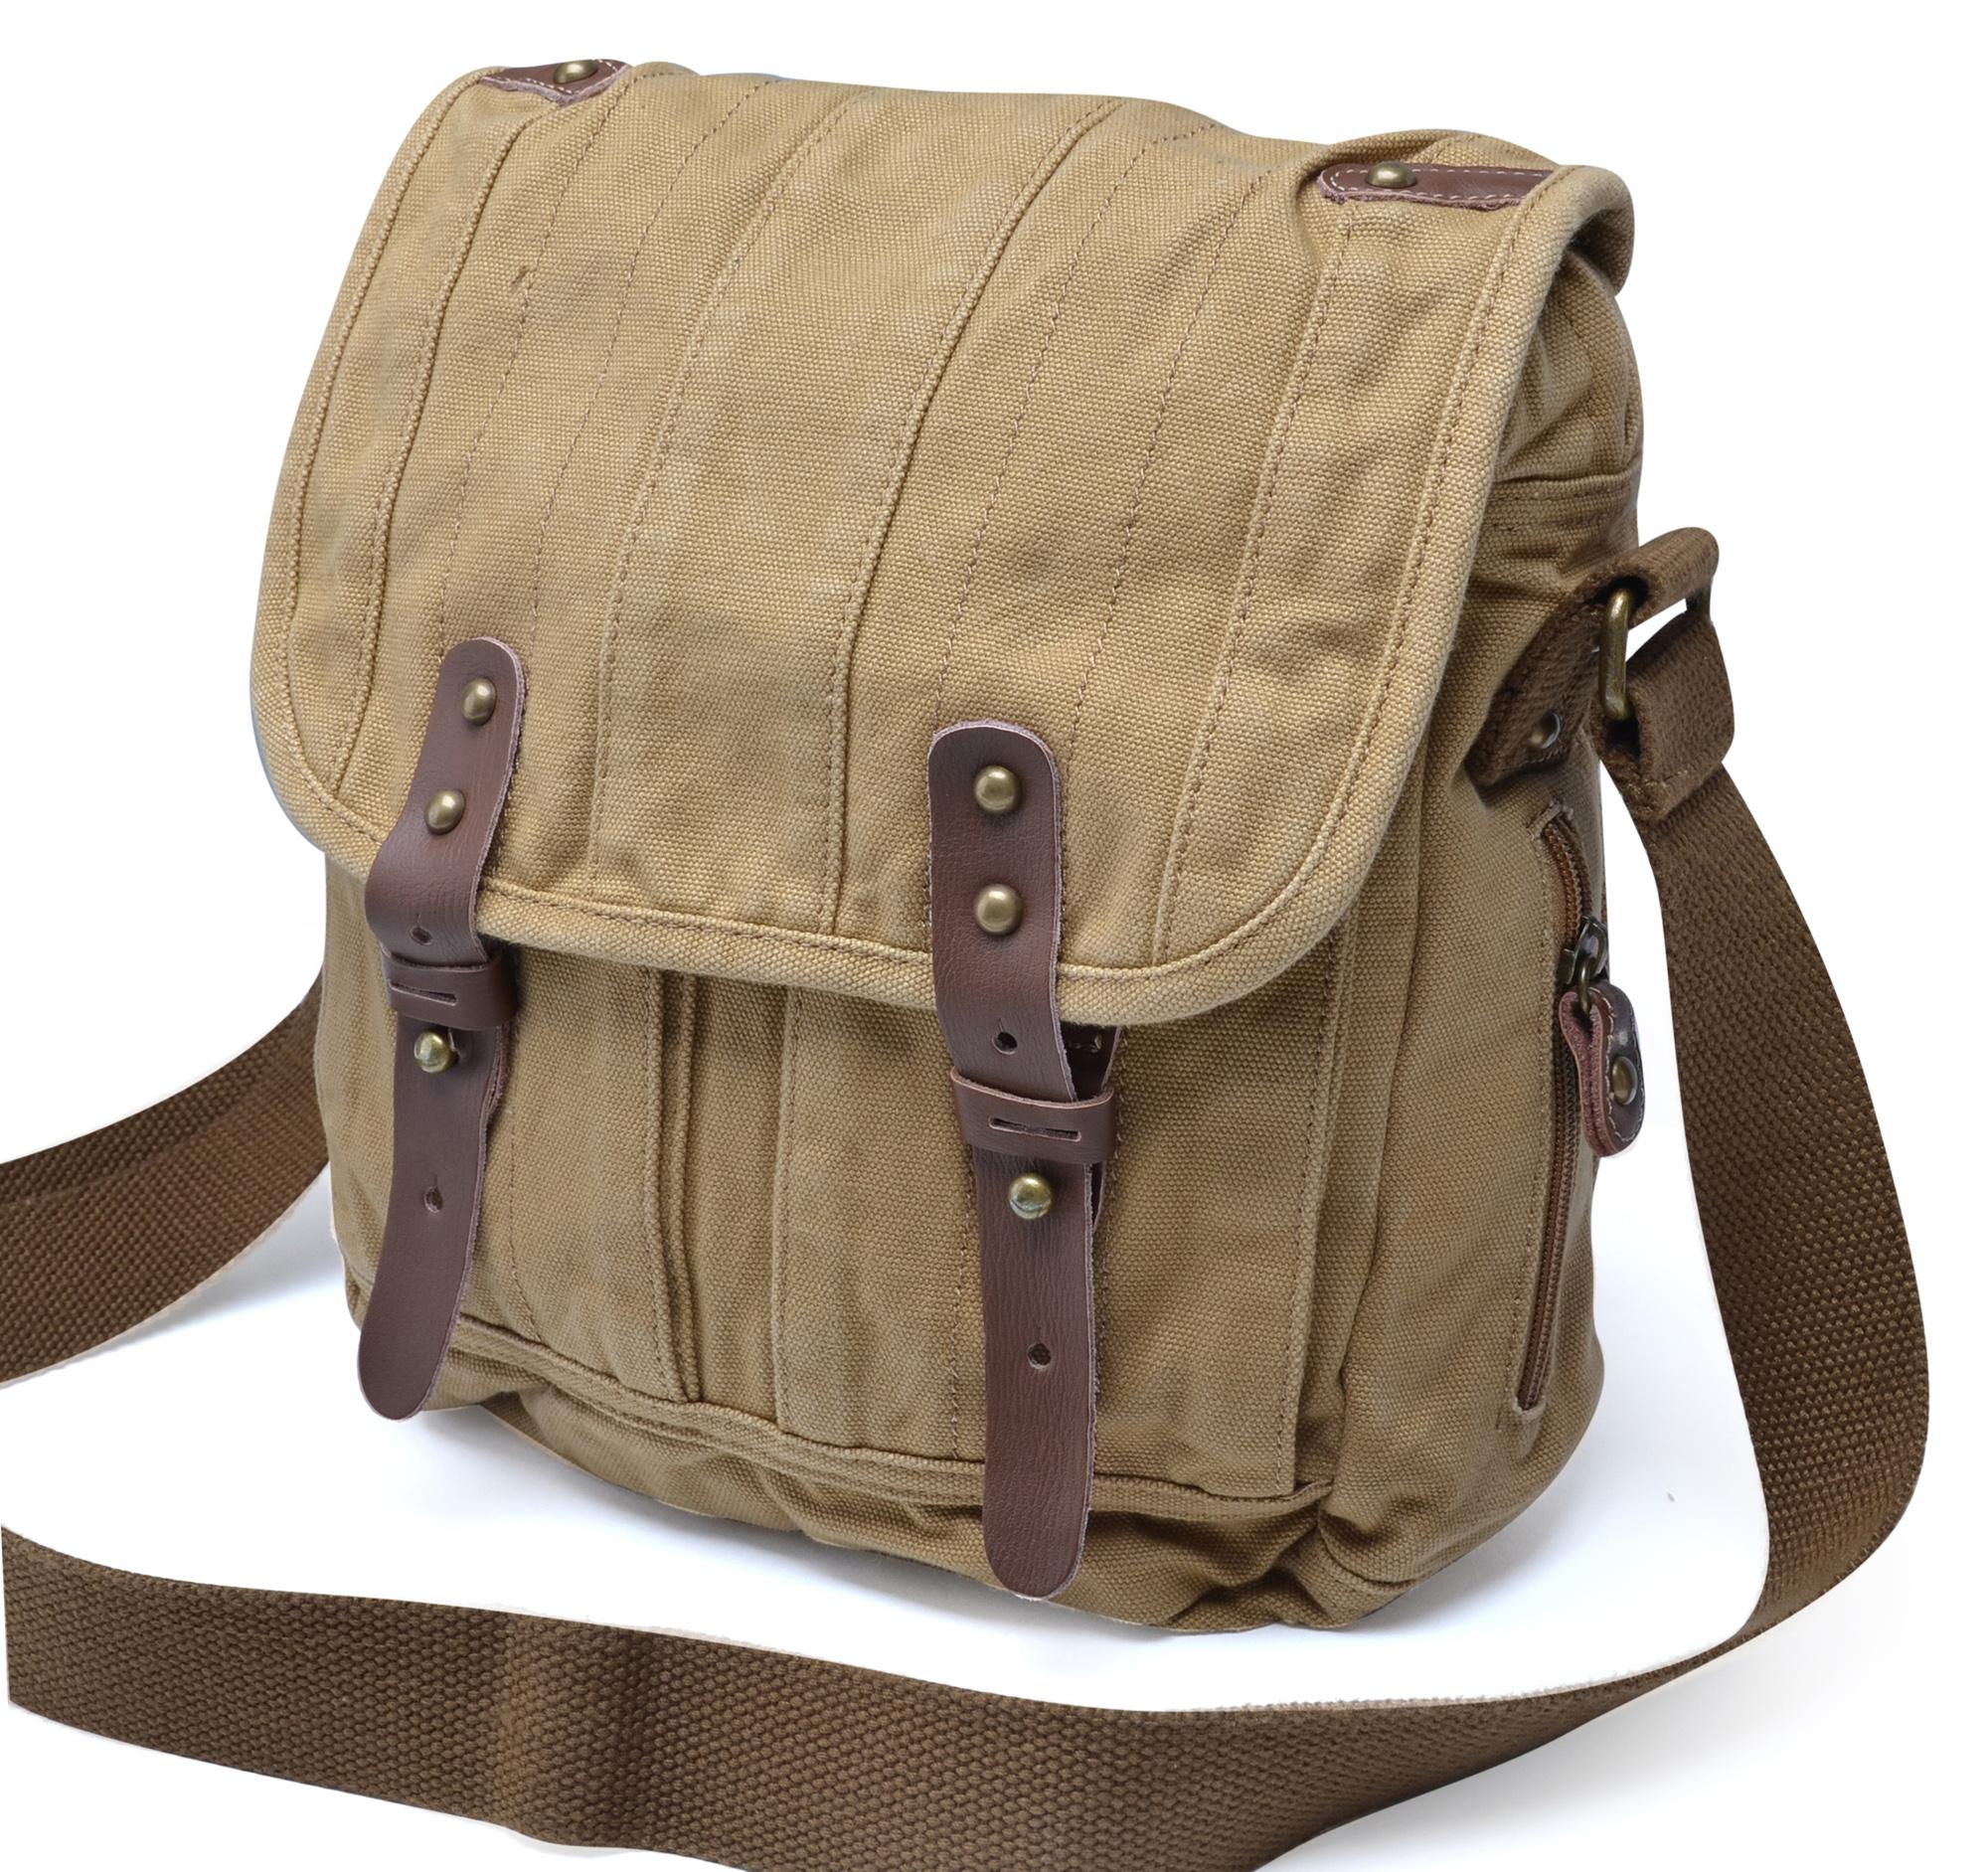 Gootium Thick Canvas Leather Cross Body Messenger Handbag Shoulder ...